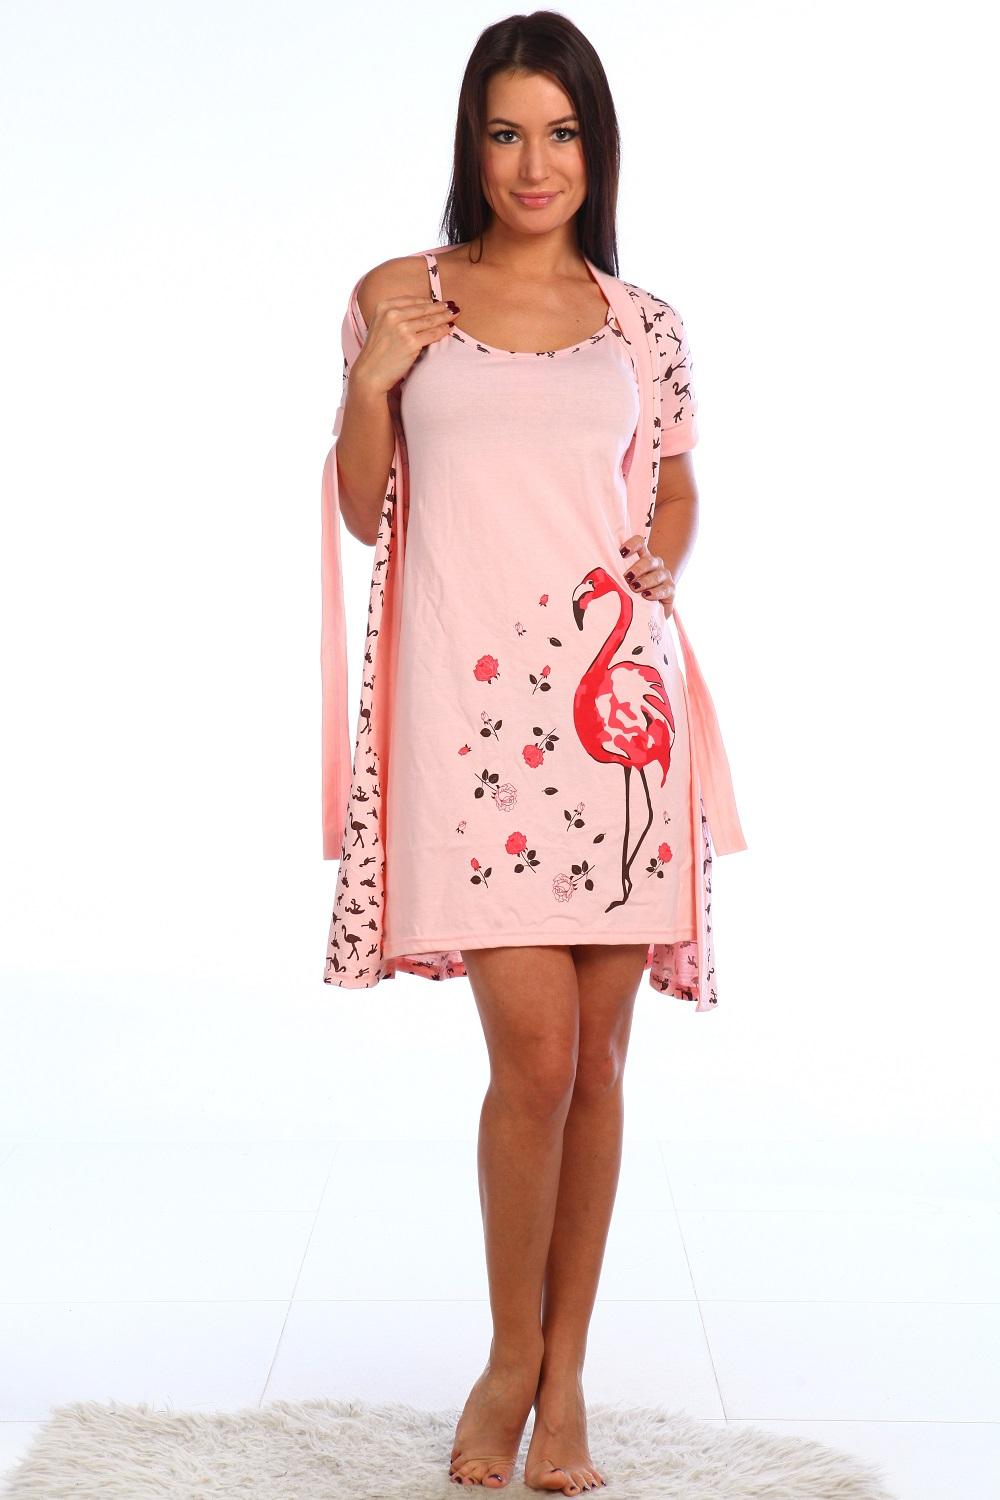 Комплект женский Пеликан  сорочка + халатПеньюары<br><br><br>Размер: 44